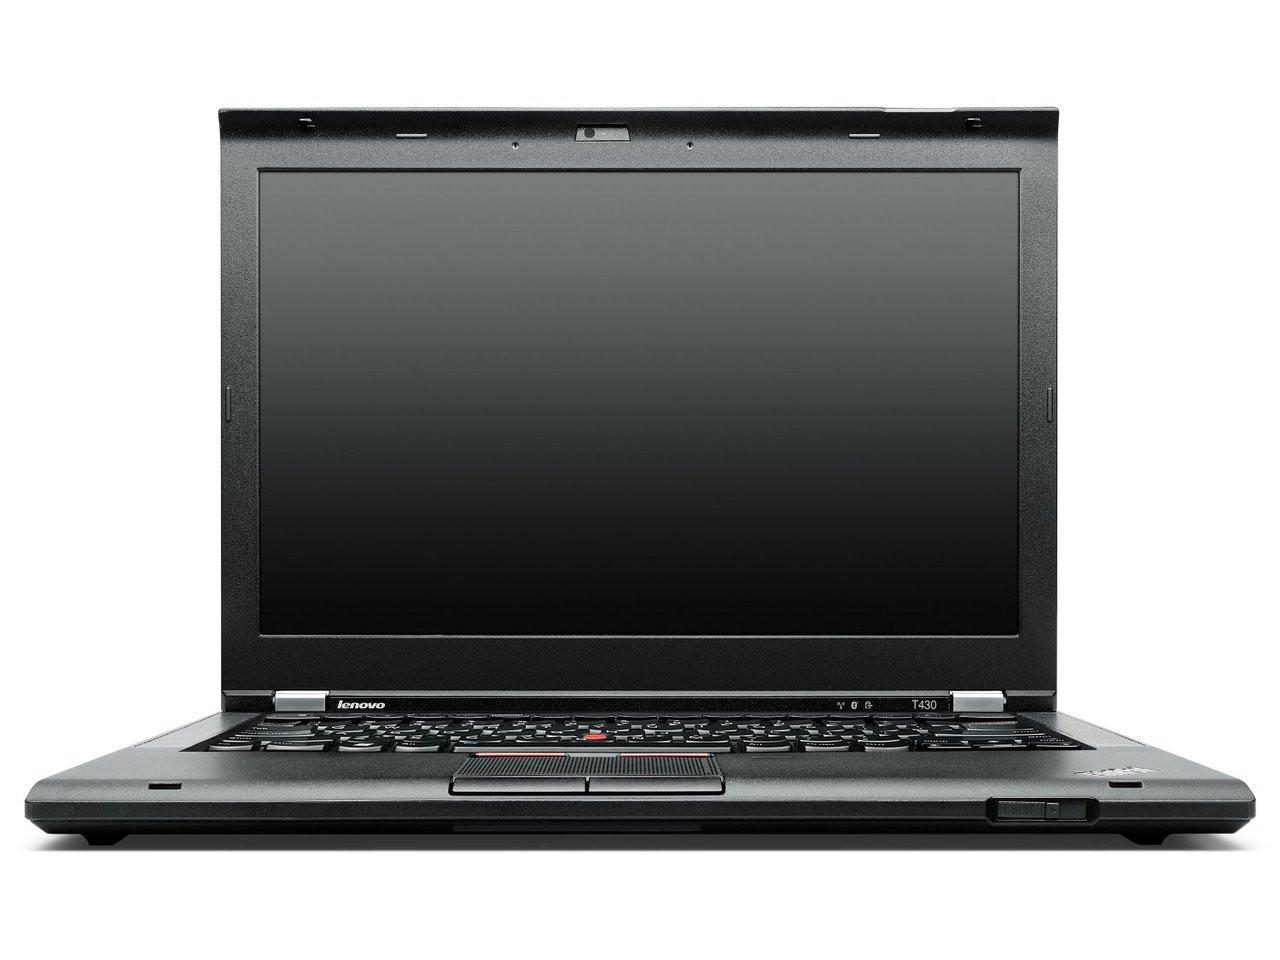 Lenovo Thinkpad T430 - Core i5 (Configure to Order)